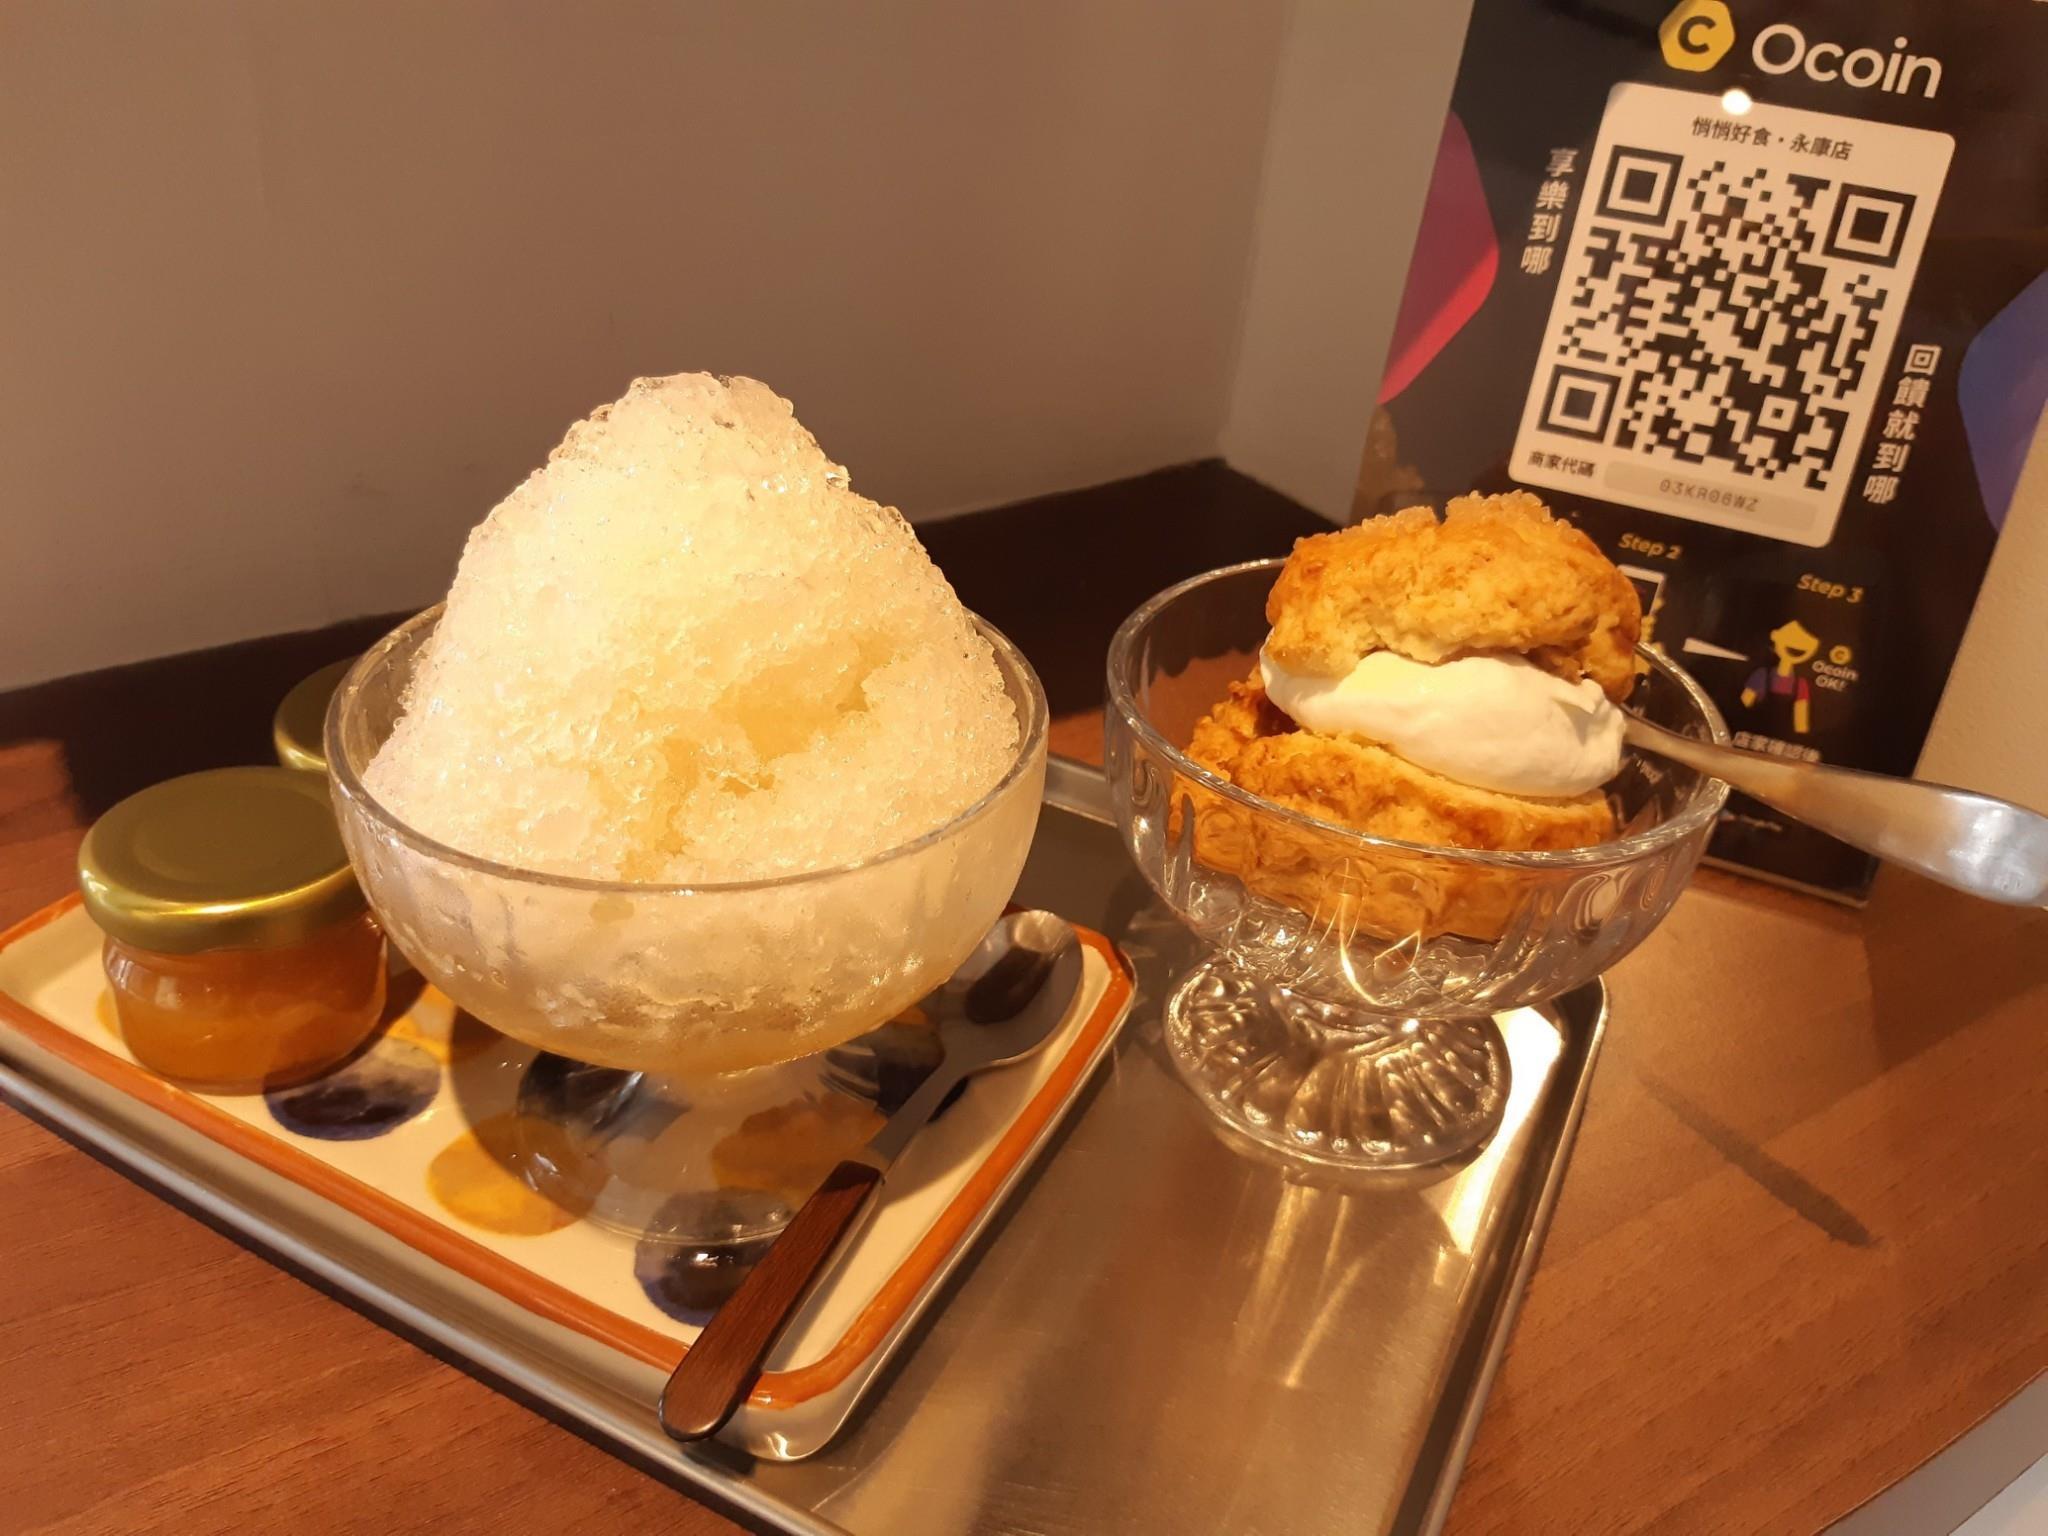 「Ocard 微奢甜點季」開跑!享用雙北甜點美食還能抽機票、賺里程數